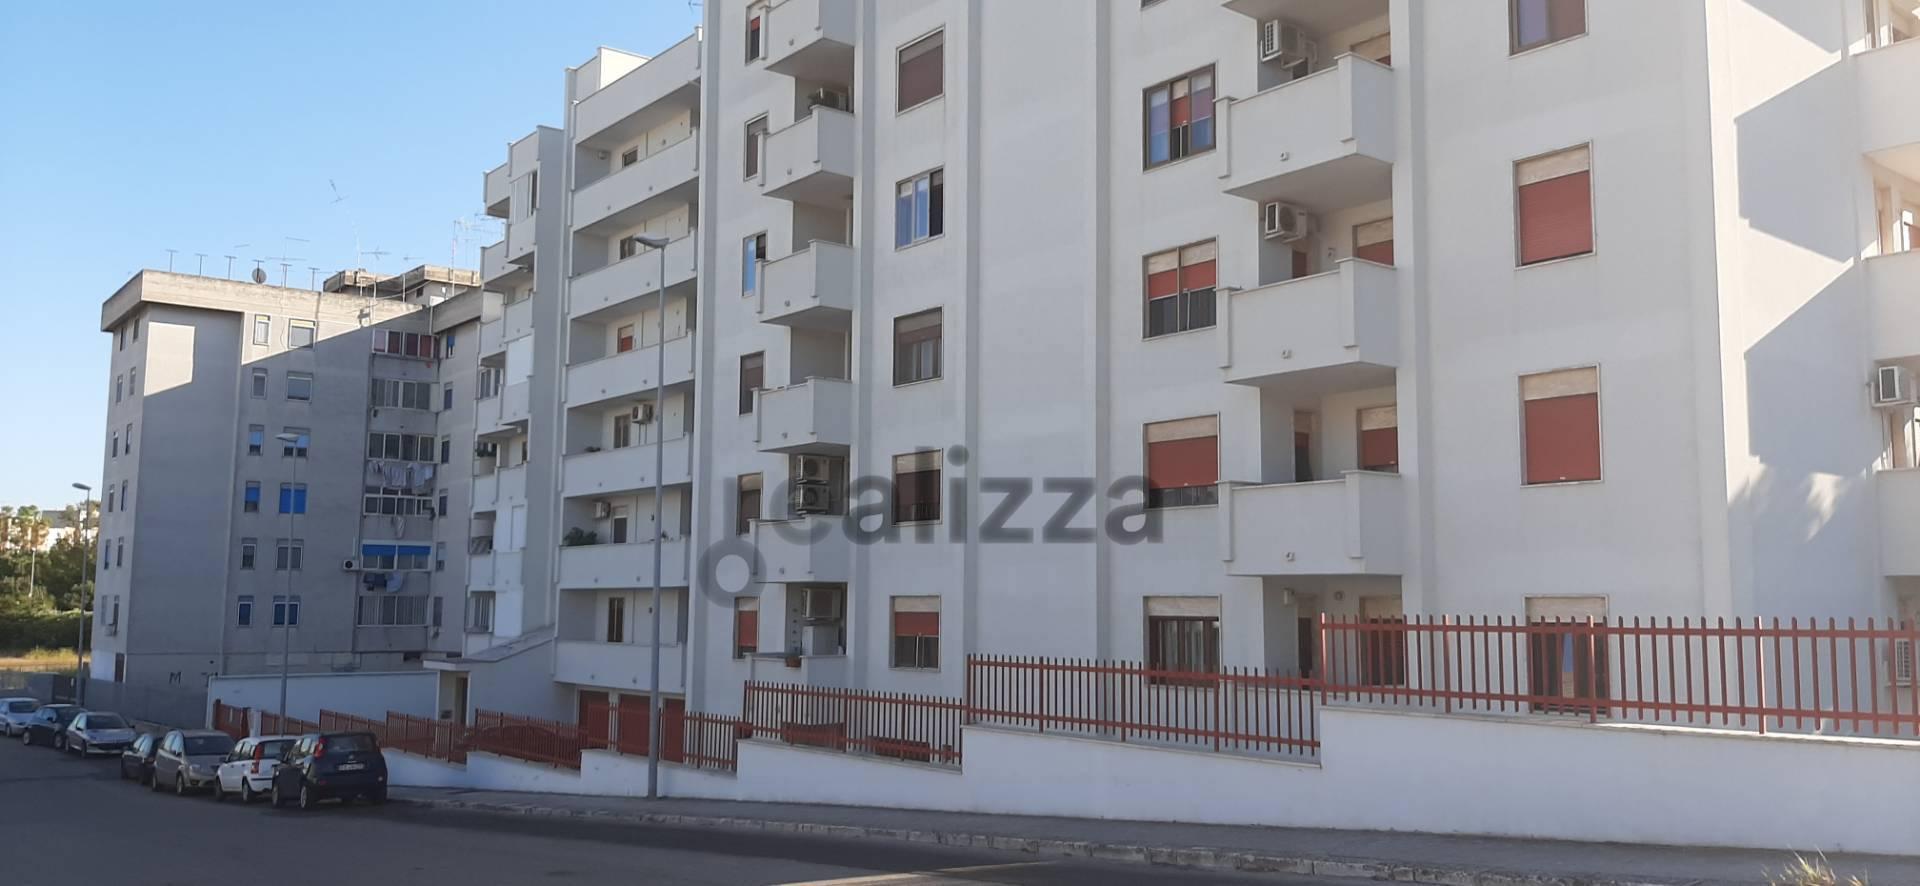 Appartamento a Brindisi (Brindisi) in Vendita